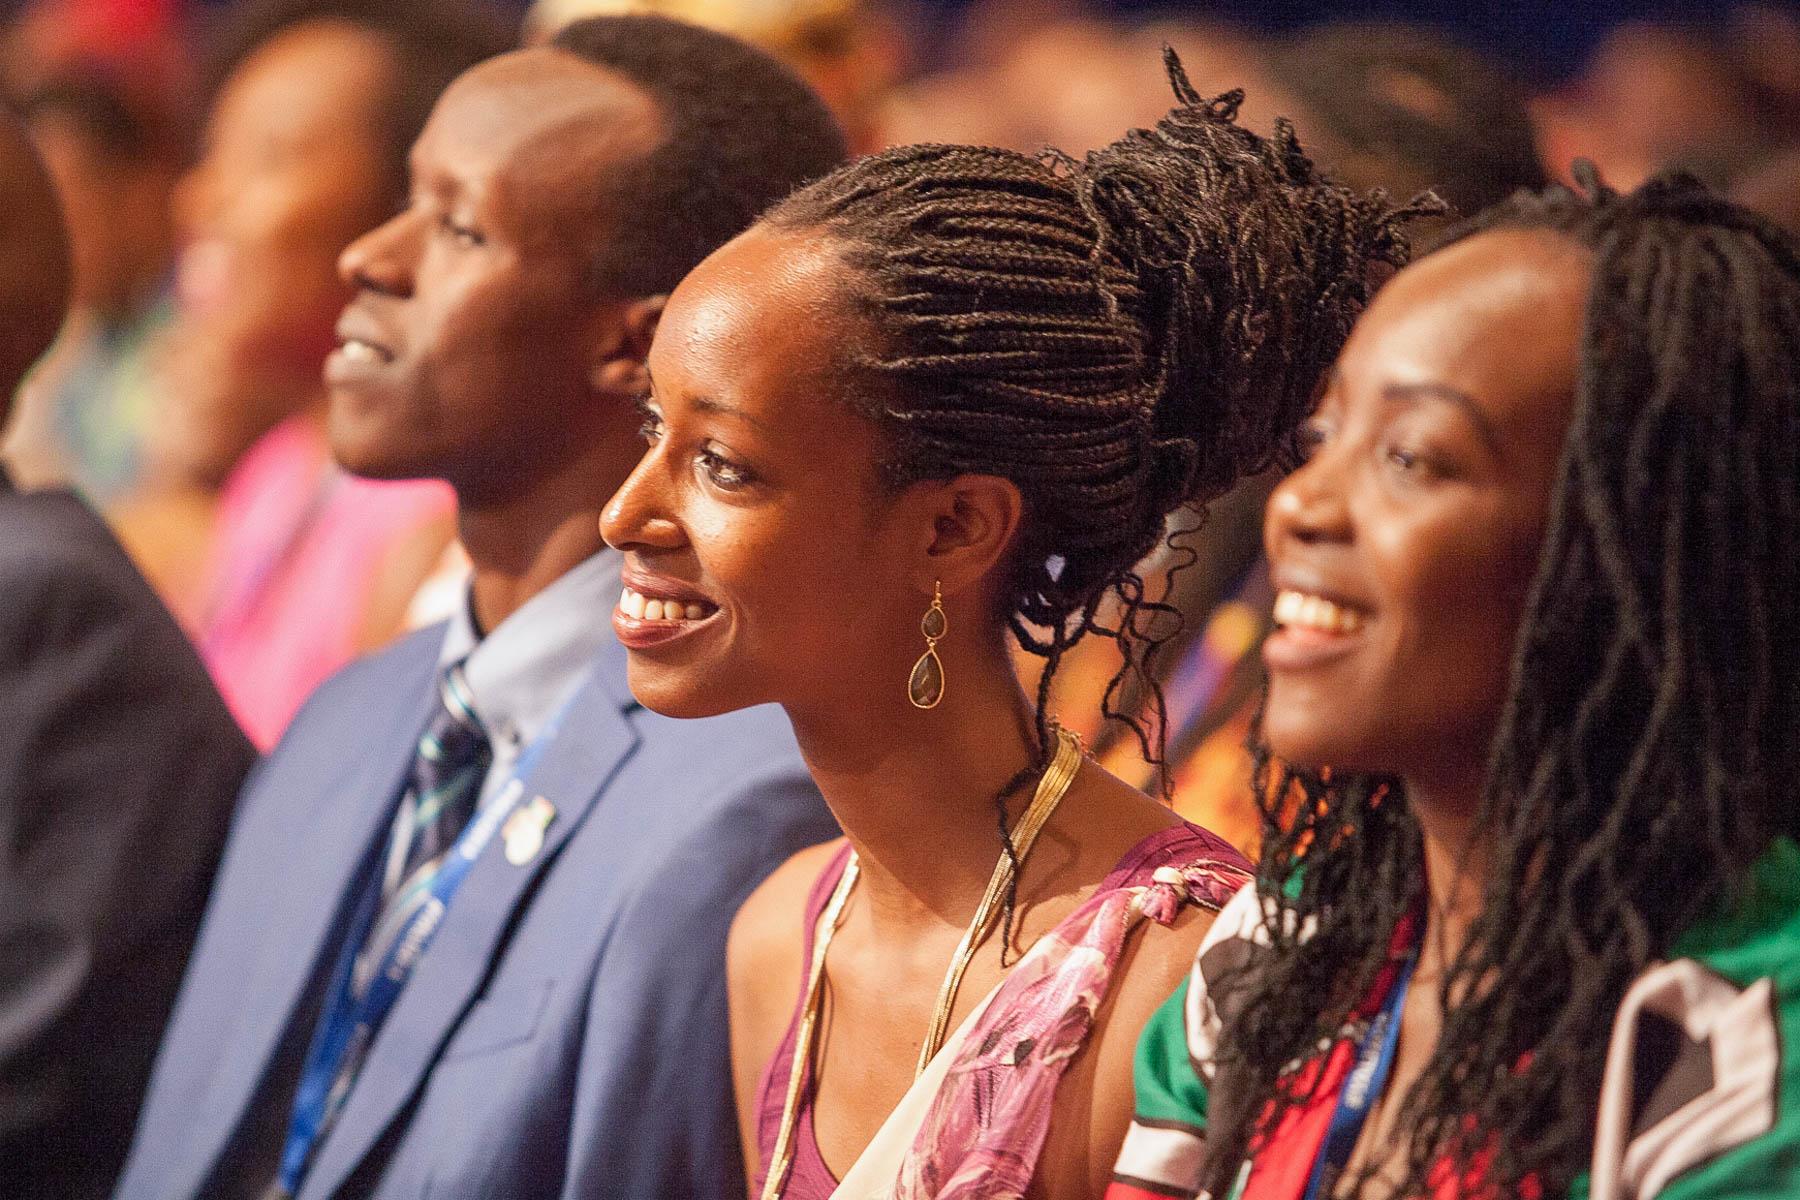 Echoing Green Fellowship 2022 for Emerging Social Entrepreneurs & Leaders Worldwide ($80,000 Seed Funding)